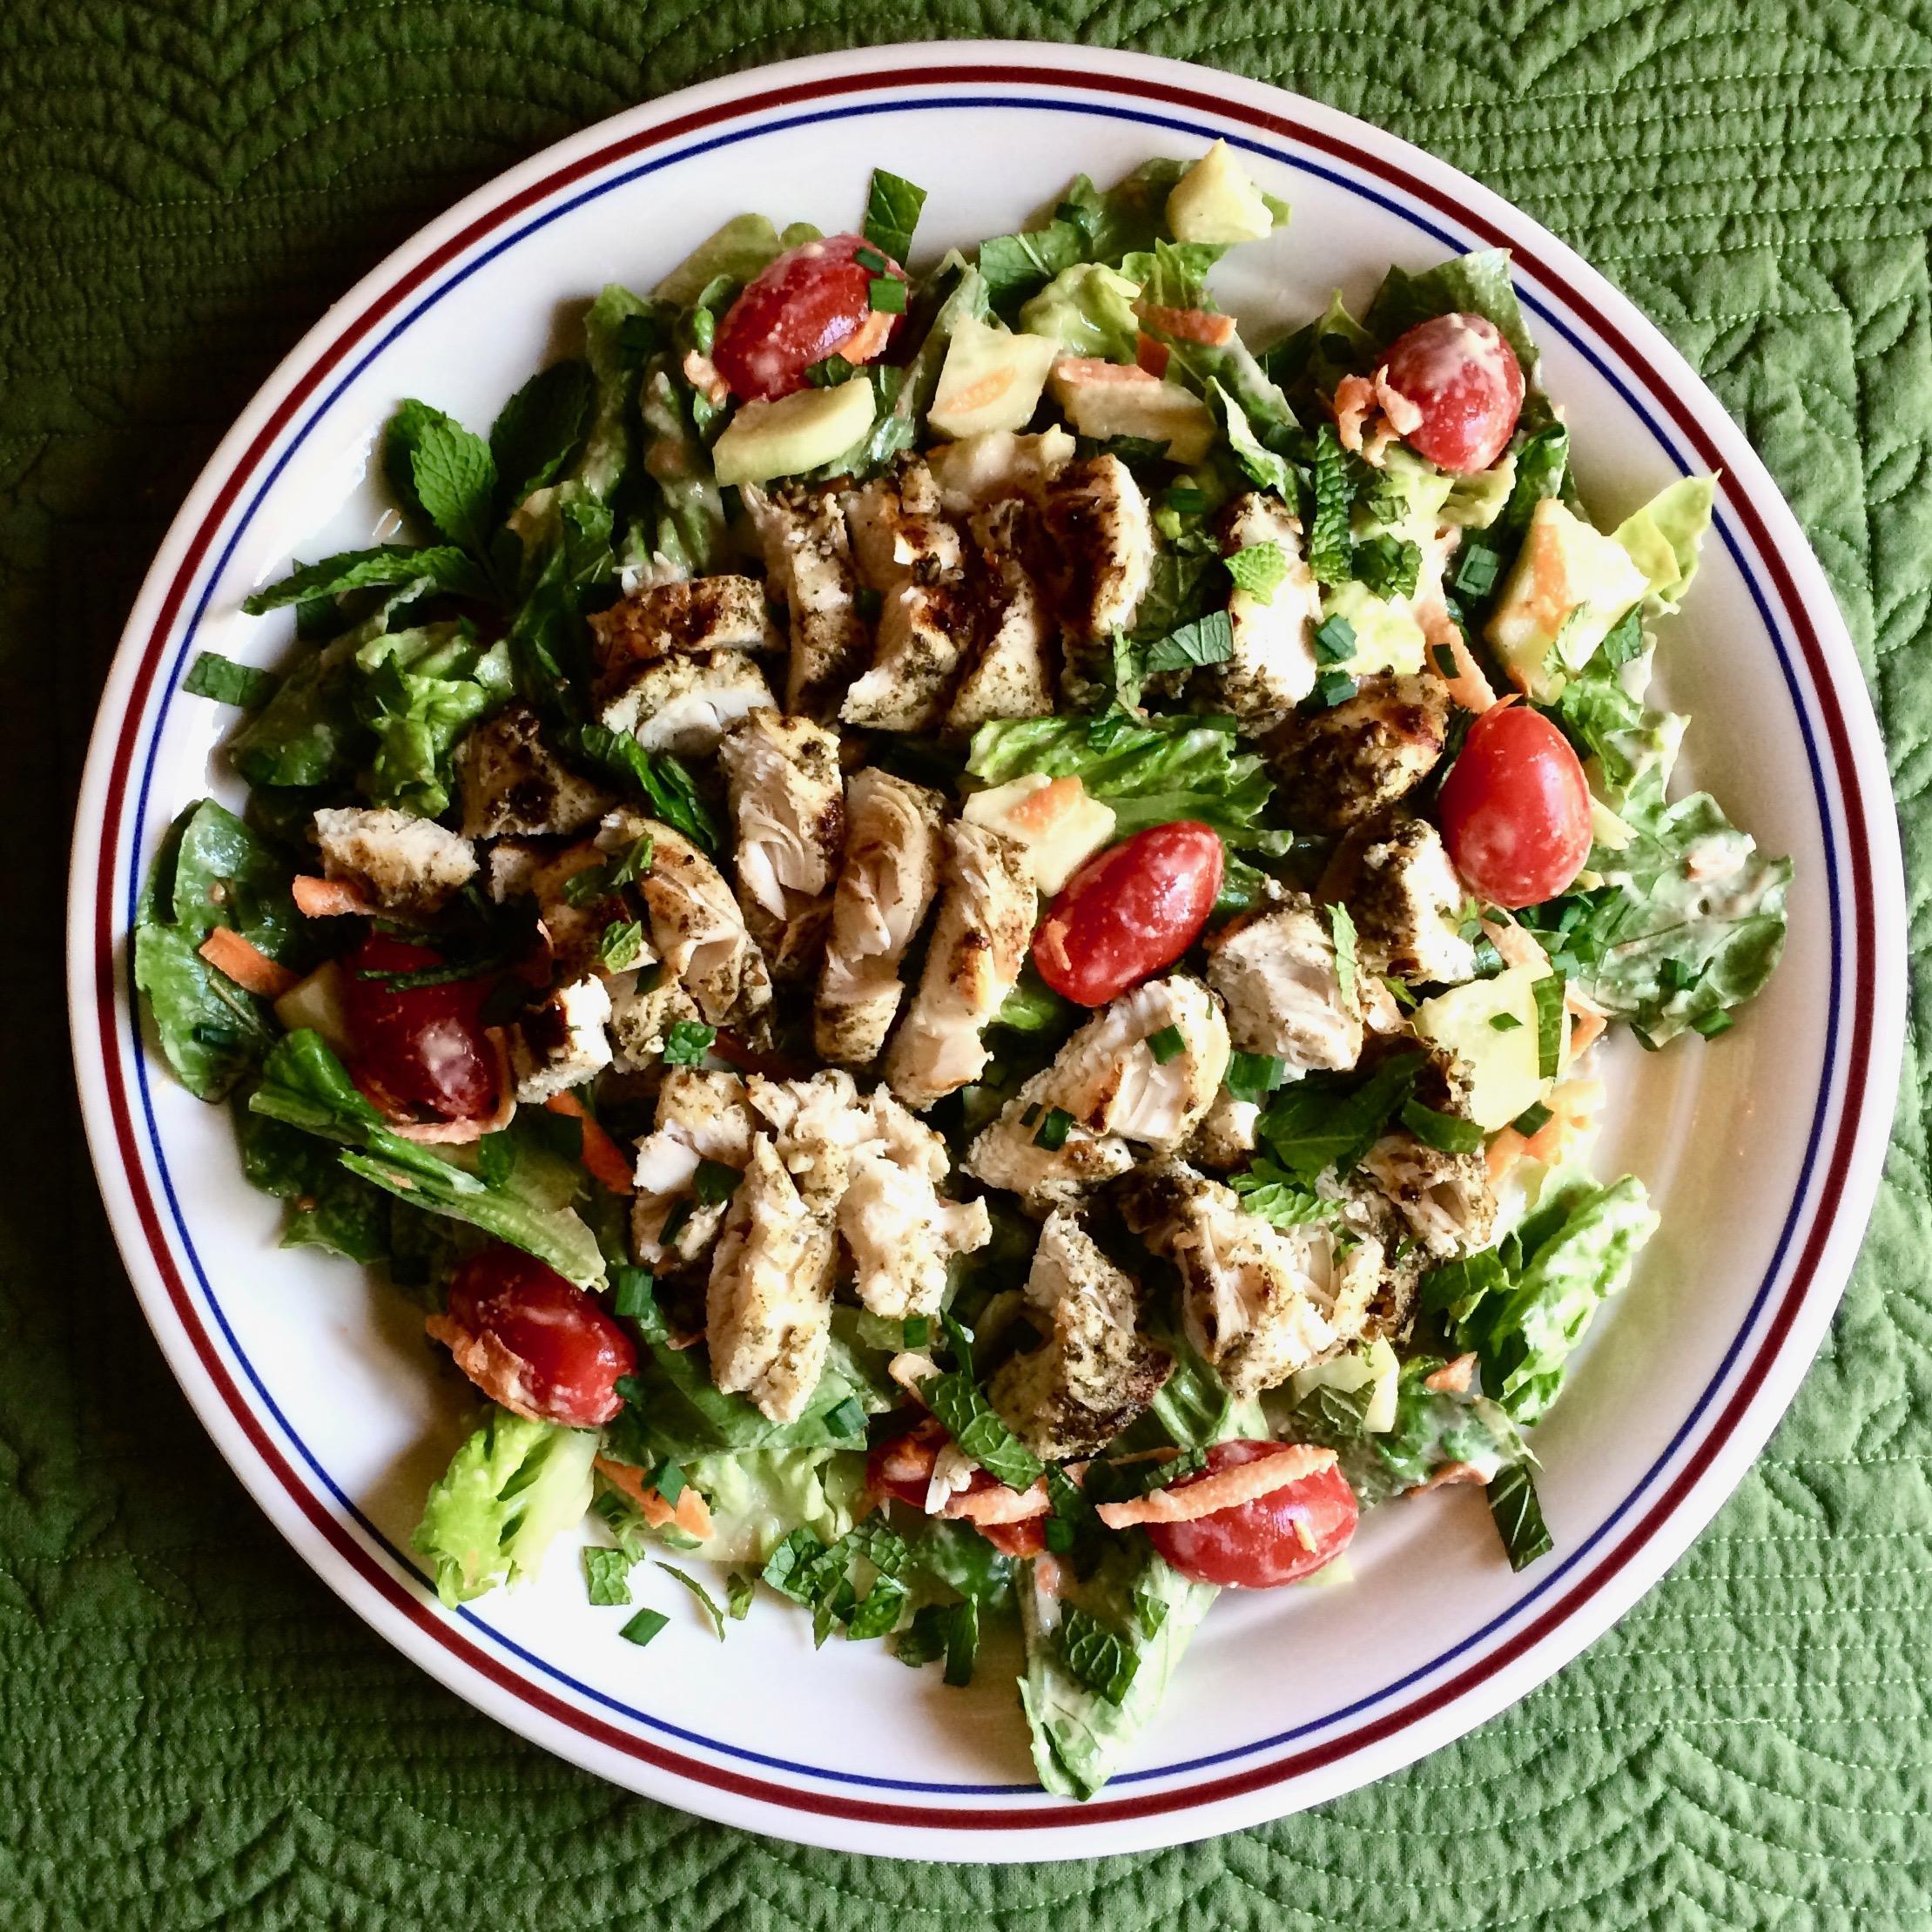 Za'atar Chicken Salad with Lemon-Tahini Dressing